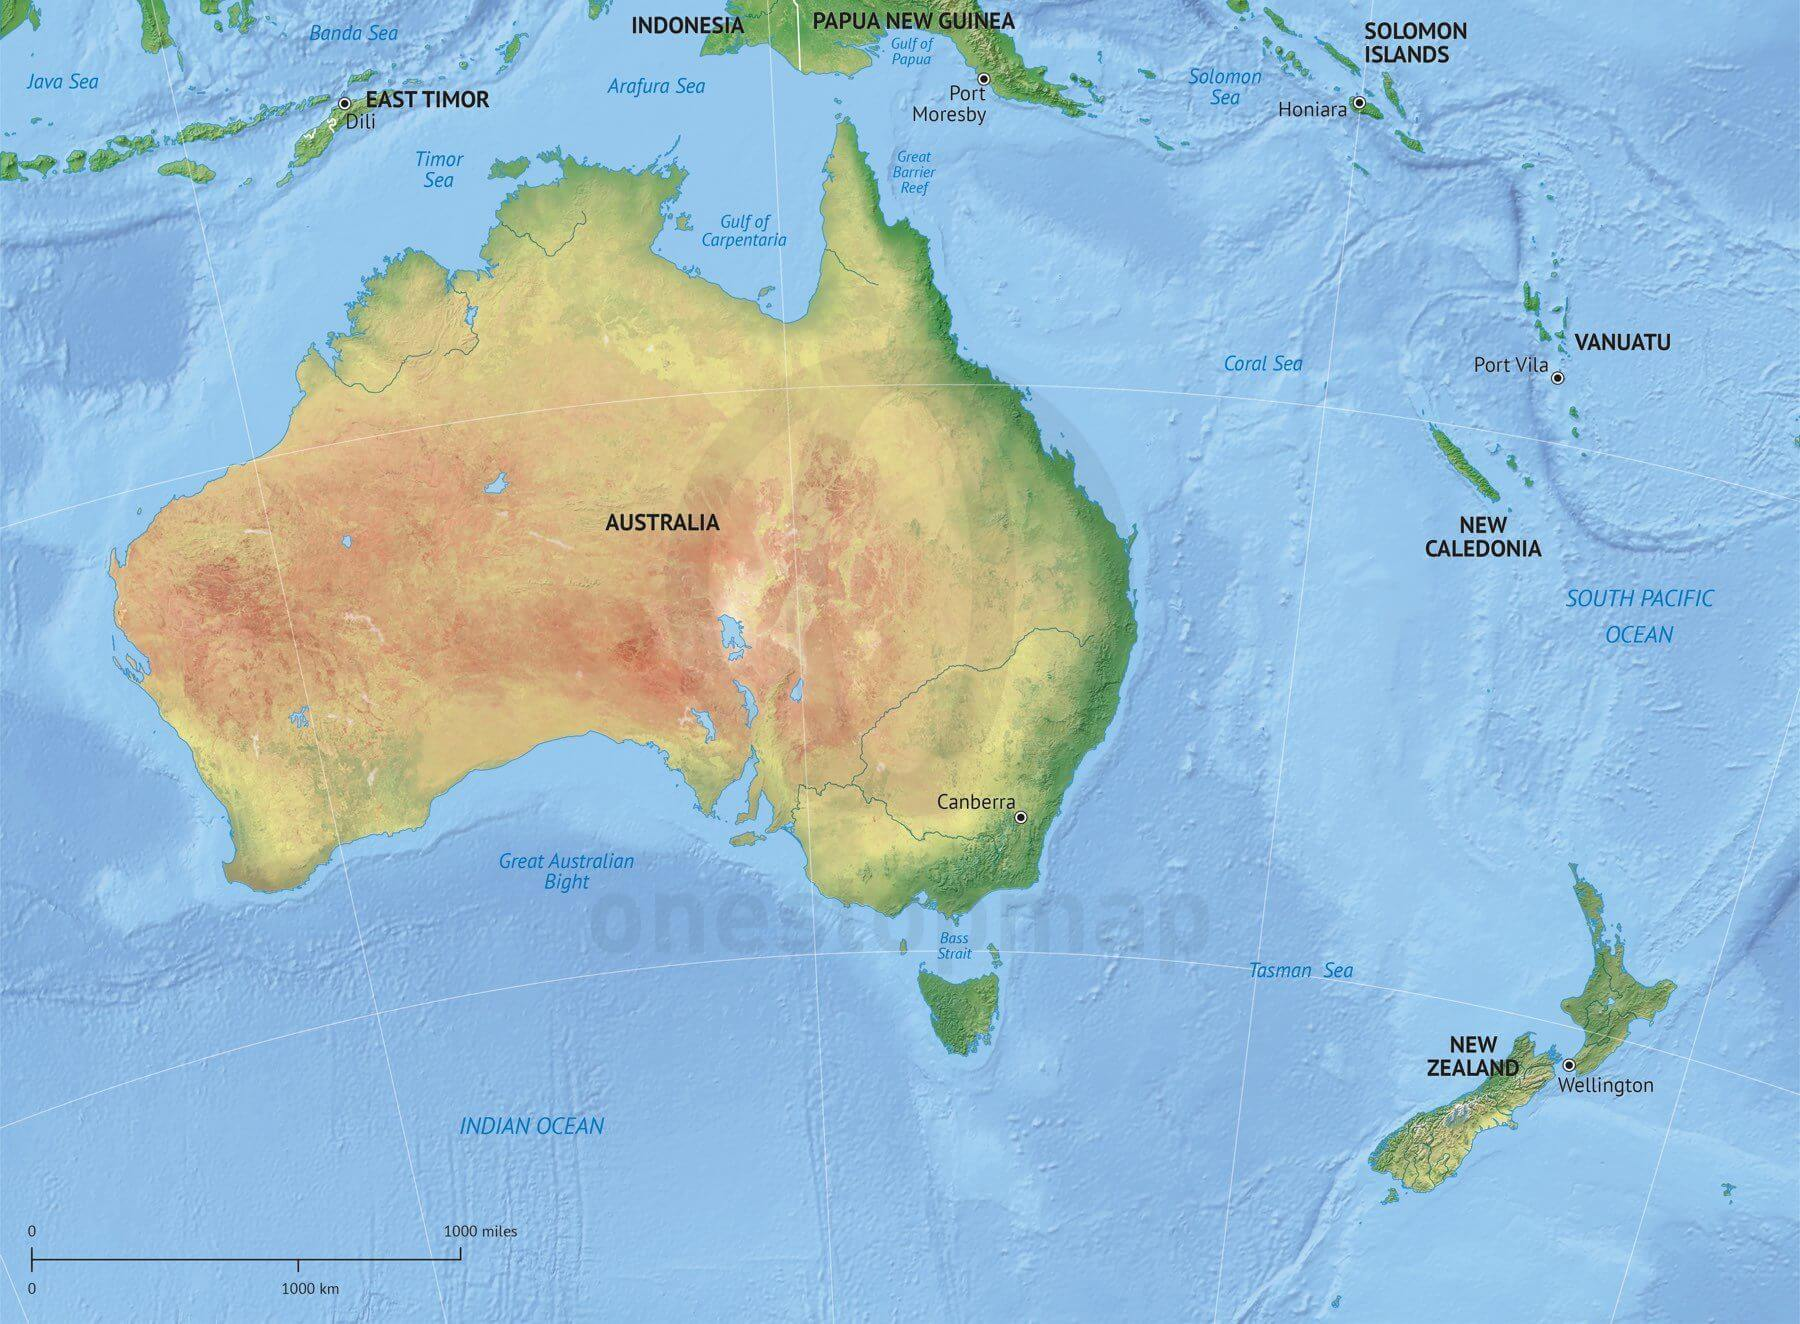 Map of Australia - New Zealand political with shaded relief Map New Zealand Australia on japan map, james cook australia map, hong kong map, international map, australian capital territory australia map, wellington australia map, country australia map, fiji australia map, indonesia australia map, asia australia map, commonwealth of australia map, sydney australia map, yarra river australia map, melanesia australia map, world map, launceston tasmania australia map, canberra australia map, dunedin australia map, papua new guinea map, lake eyre basin australia map,